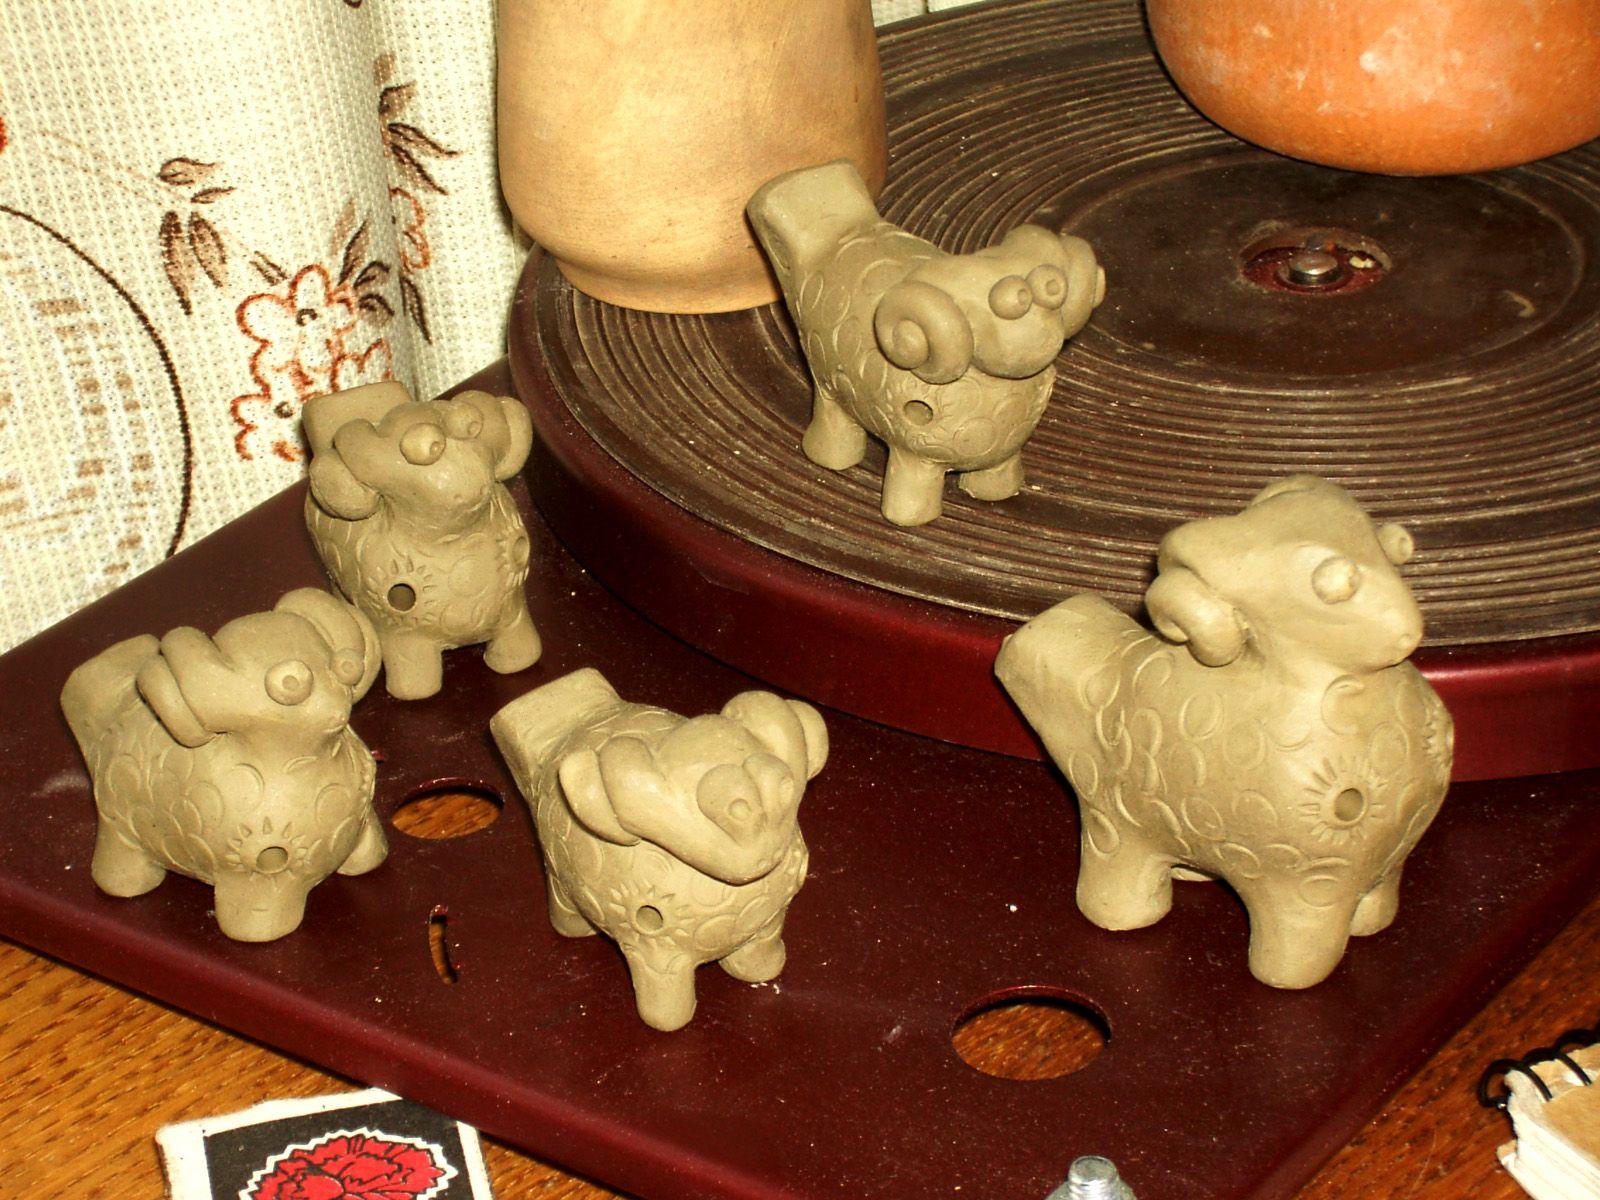 Flock of sheep - (c) Anatol Filozof